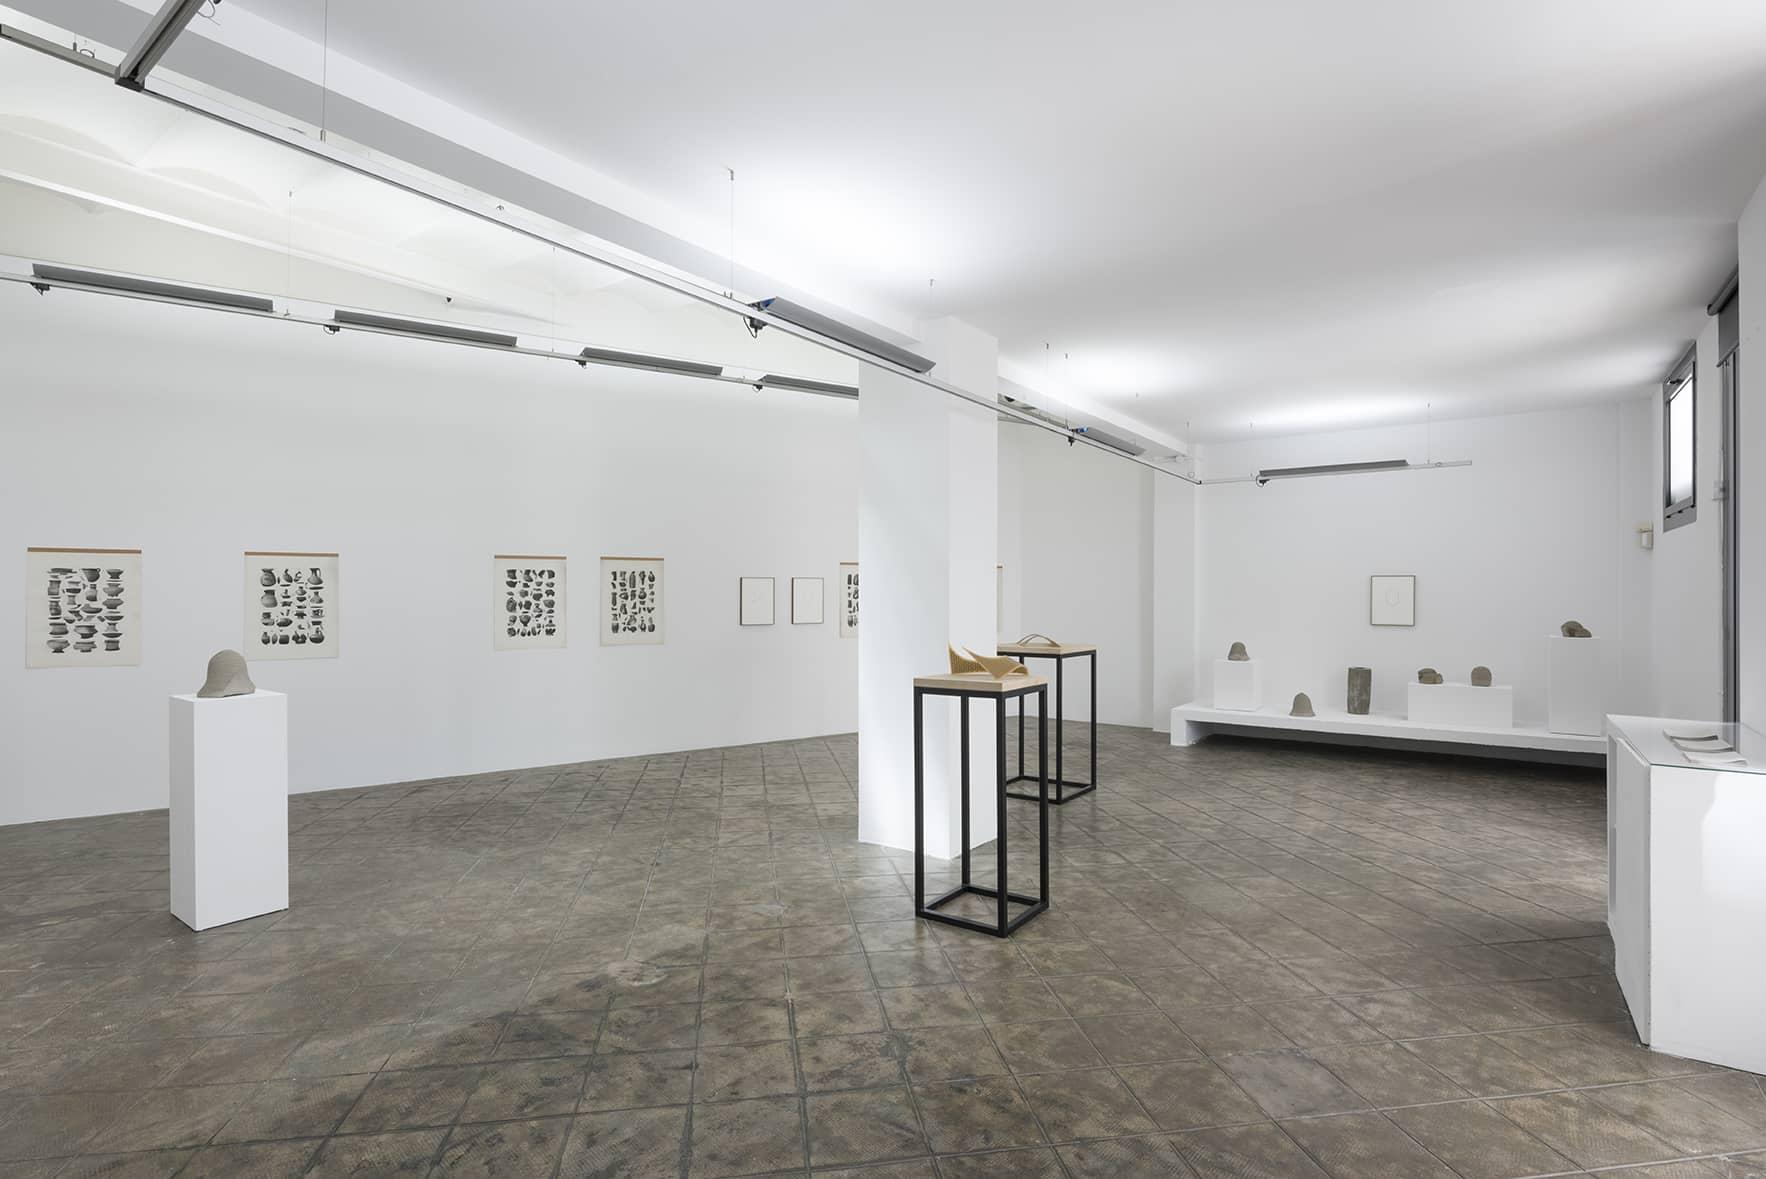 Installation view: Concavitat, 2017, ProjecteSD, Barcelona |  | ProjecteSD